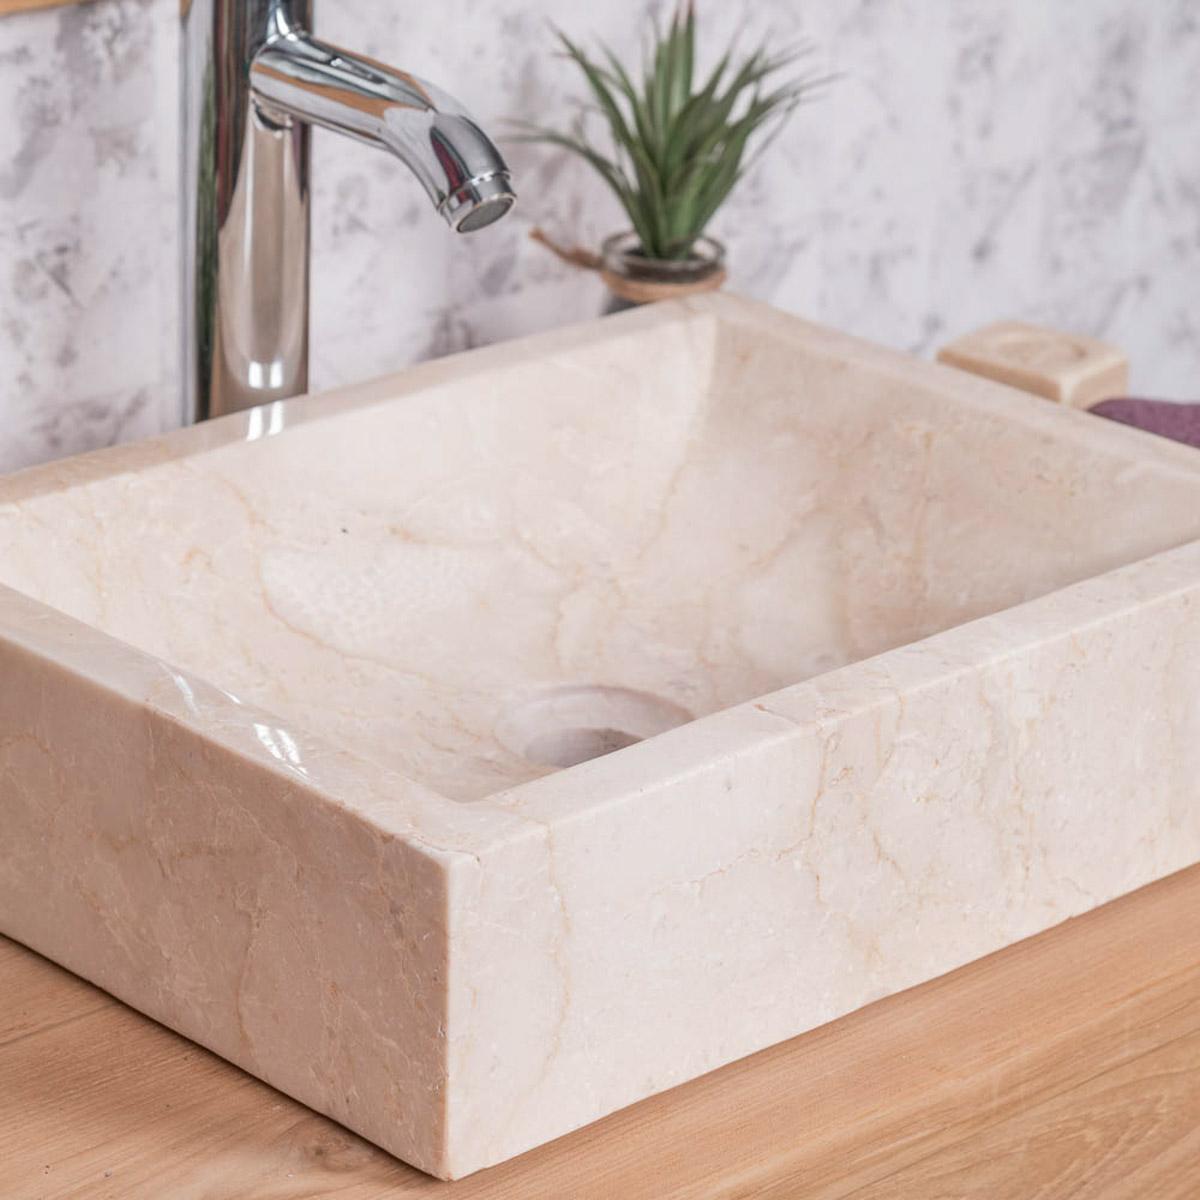 vasque poser marbre rectangle cr me alexandrie l 40 x p 30 x h 10 cm. Black Bedroom Furniture Sets. Home Design Ideas